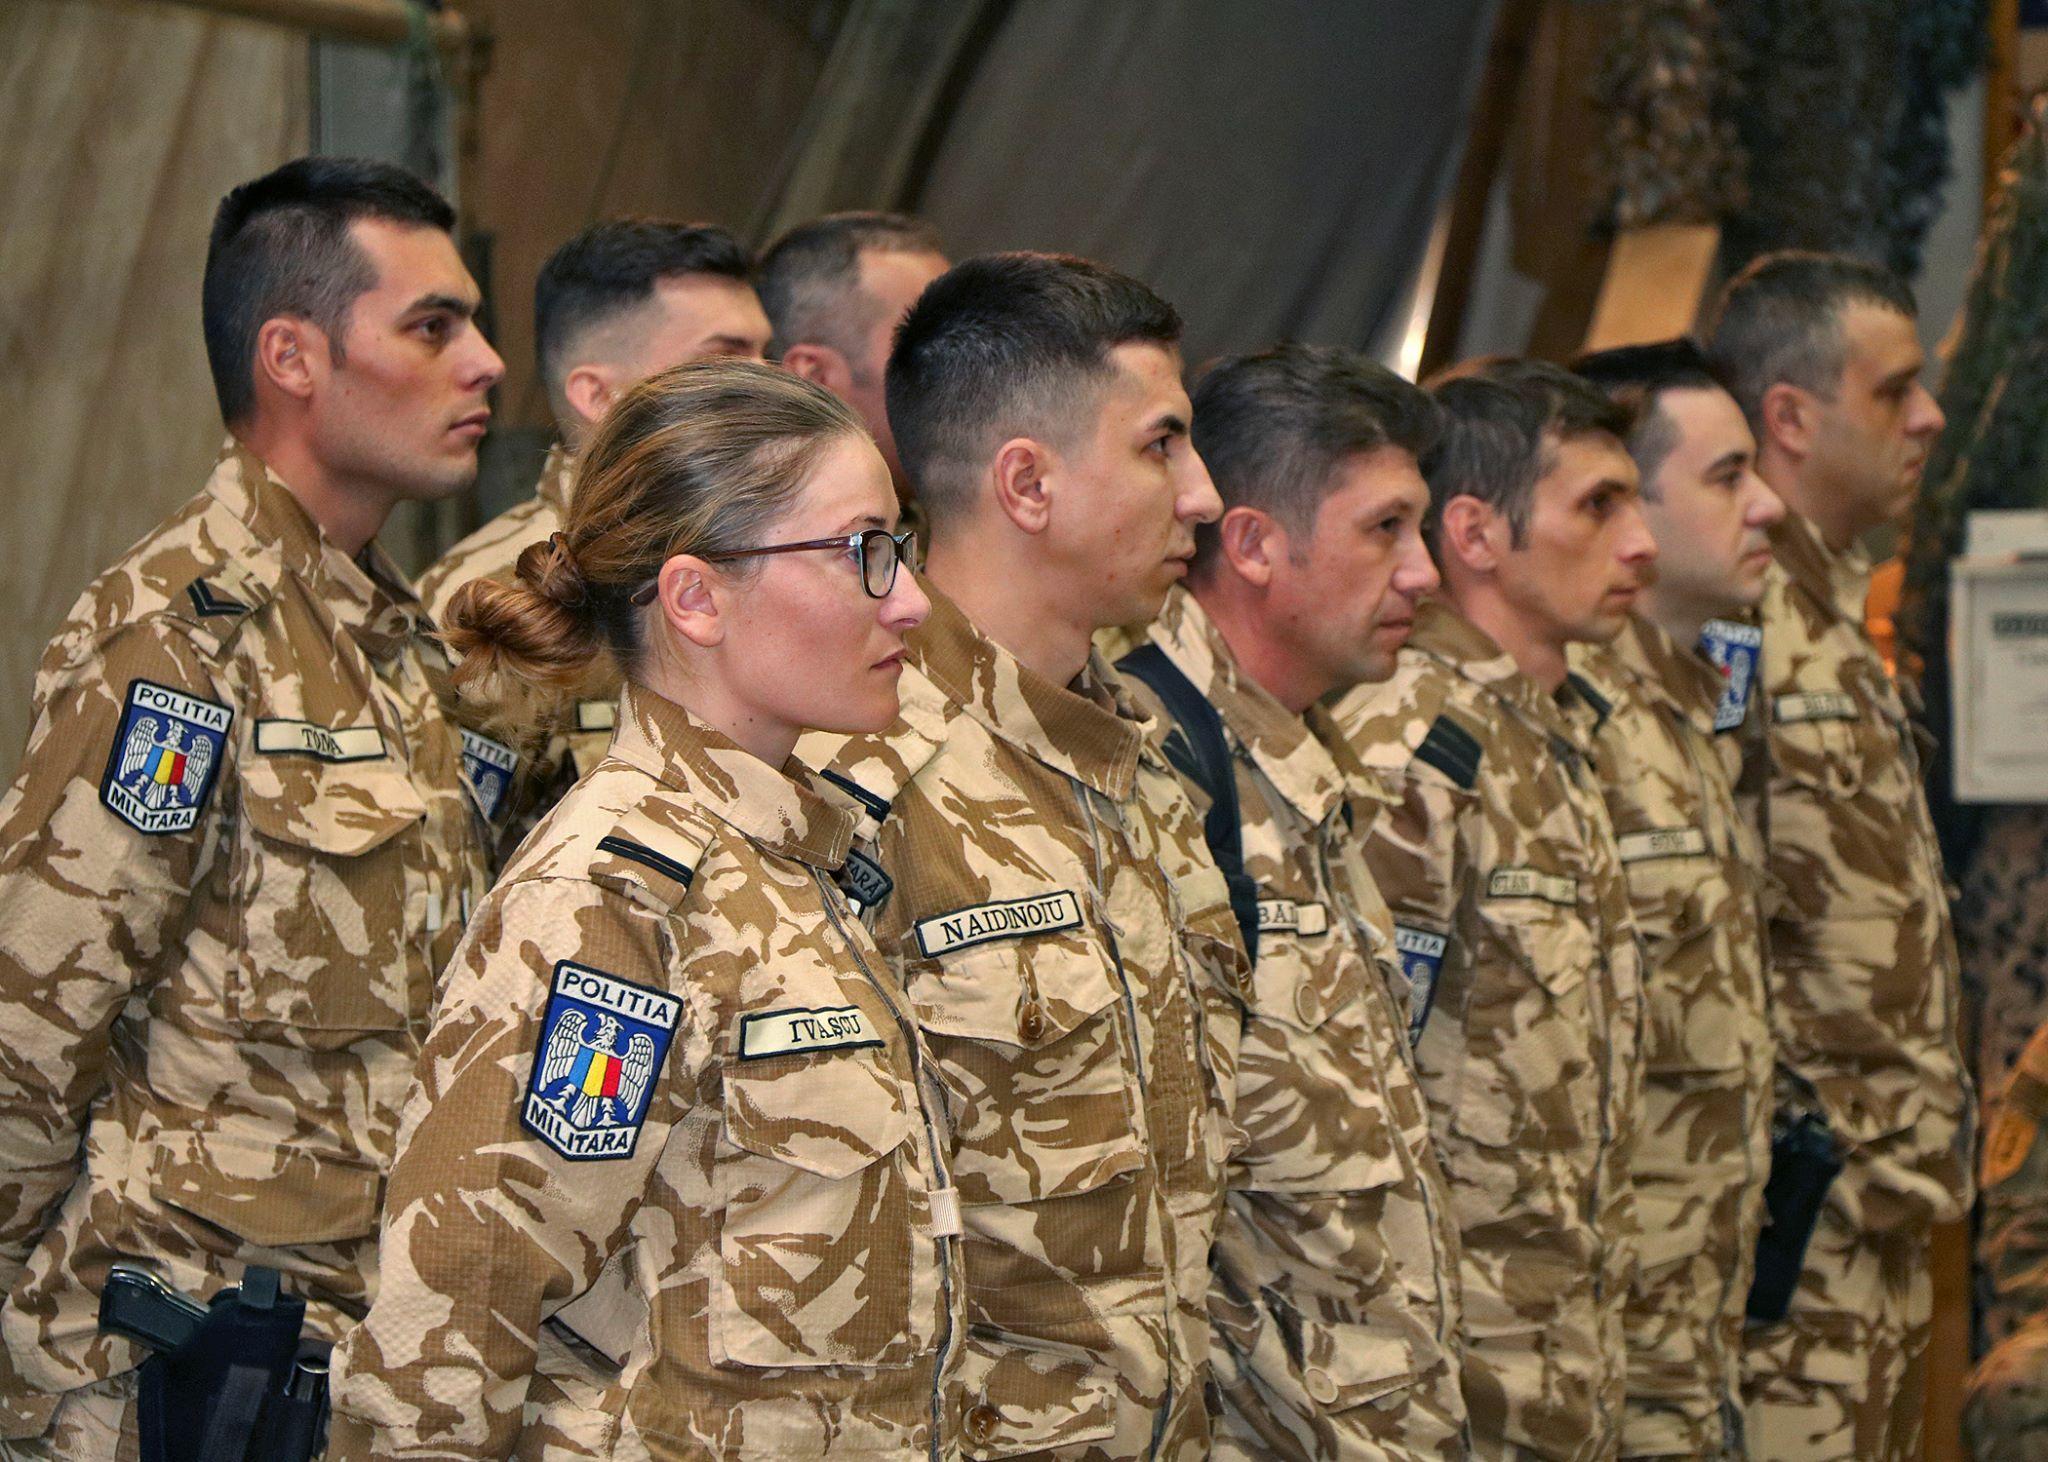 Primul detasament romanesc comandat de o femeie s-a intors din Afganistan. Misiunile la care a participat in Bagram